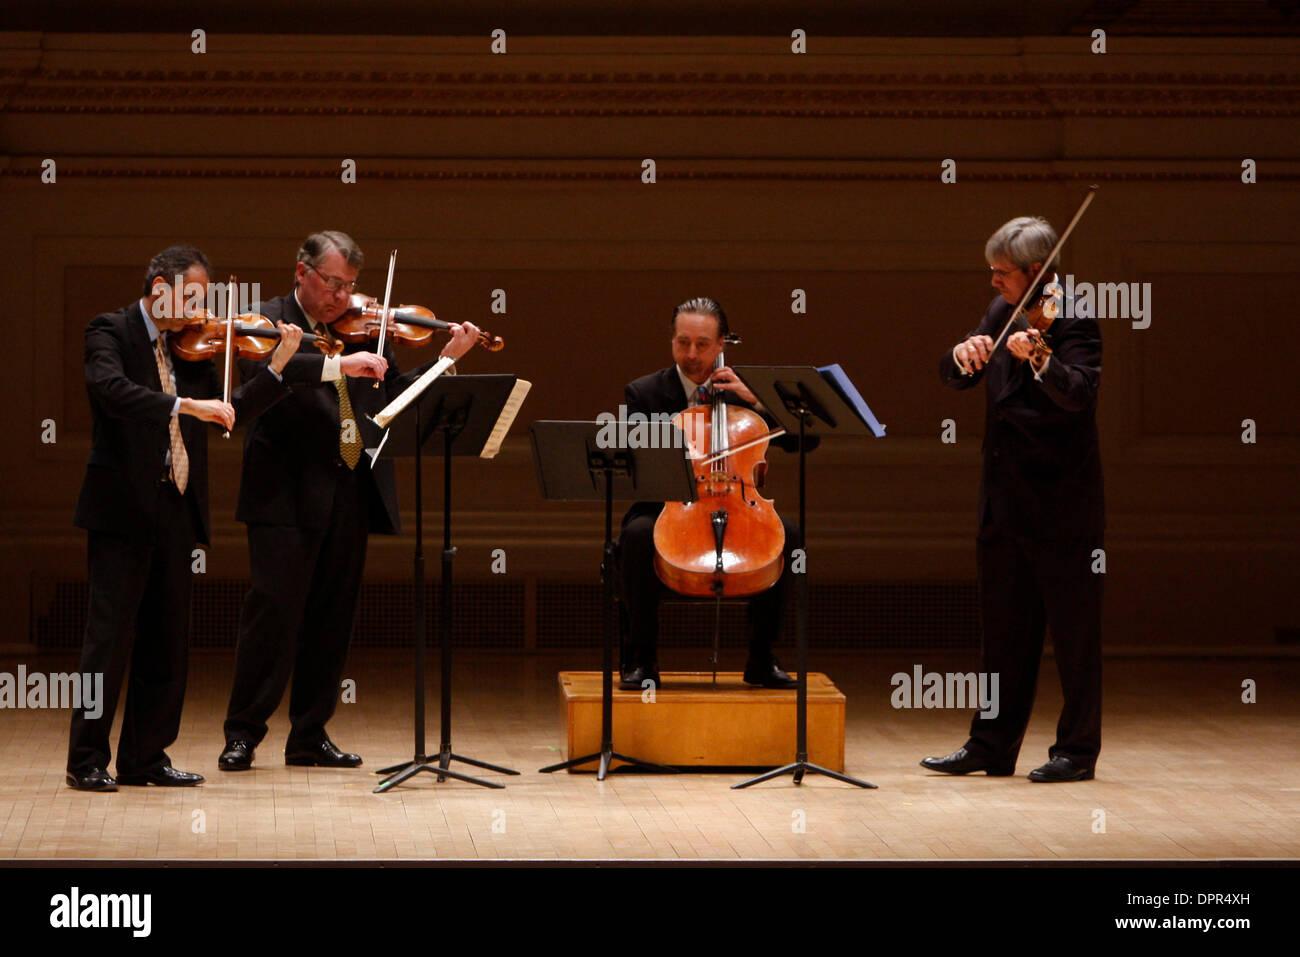 String Quartet Performing Stock Photos & String Quartet Performing